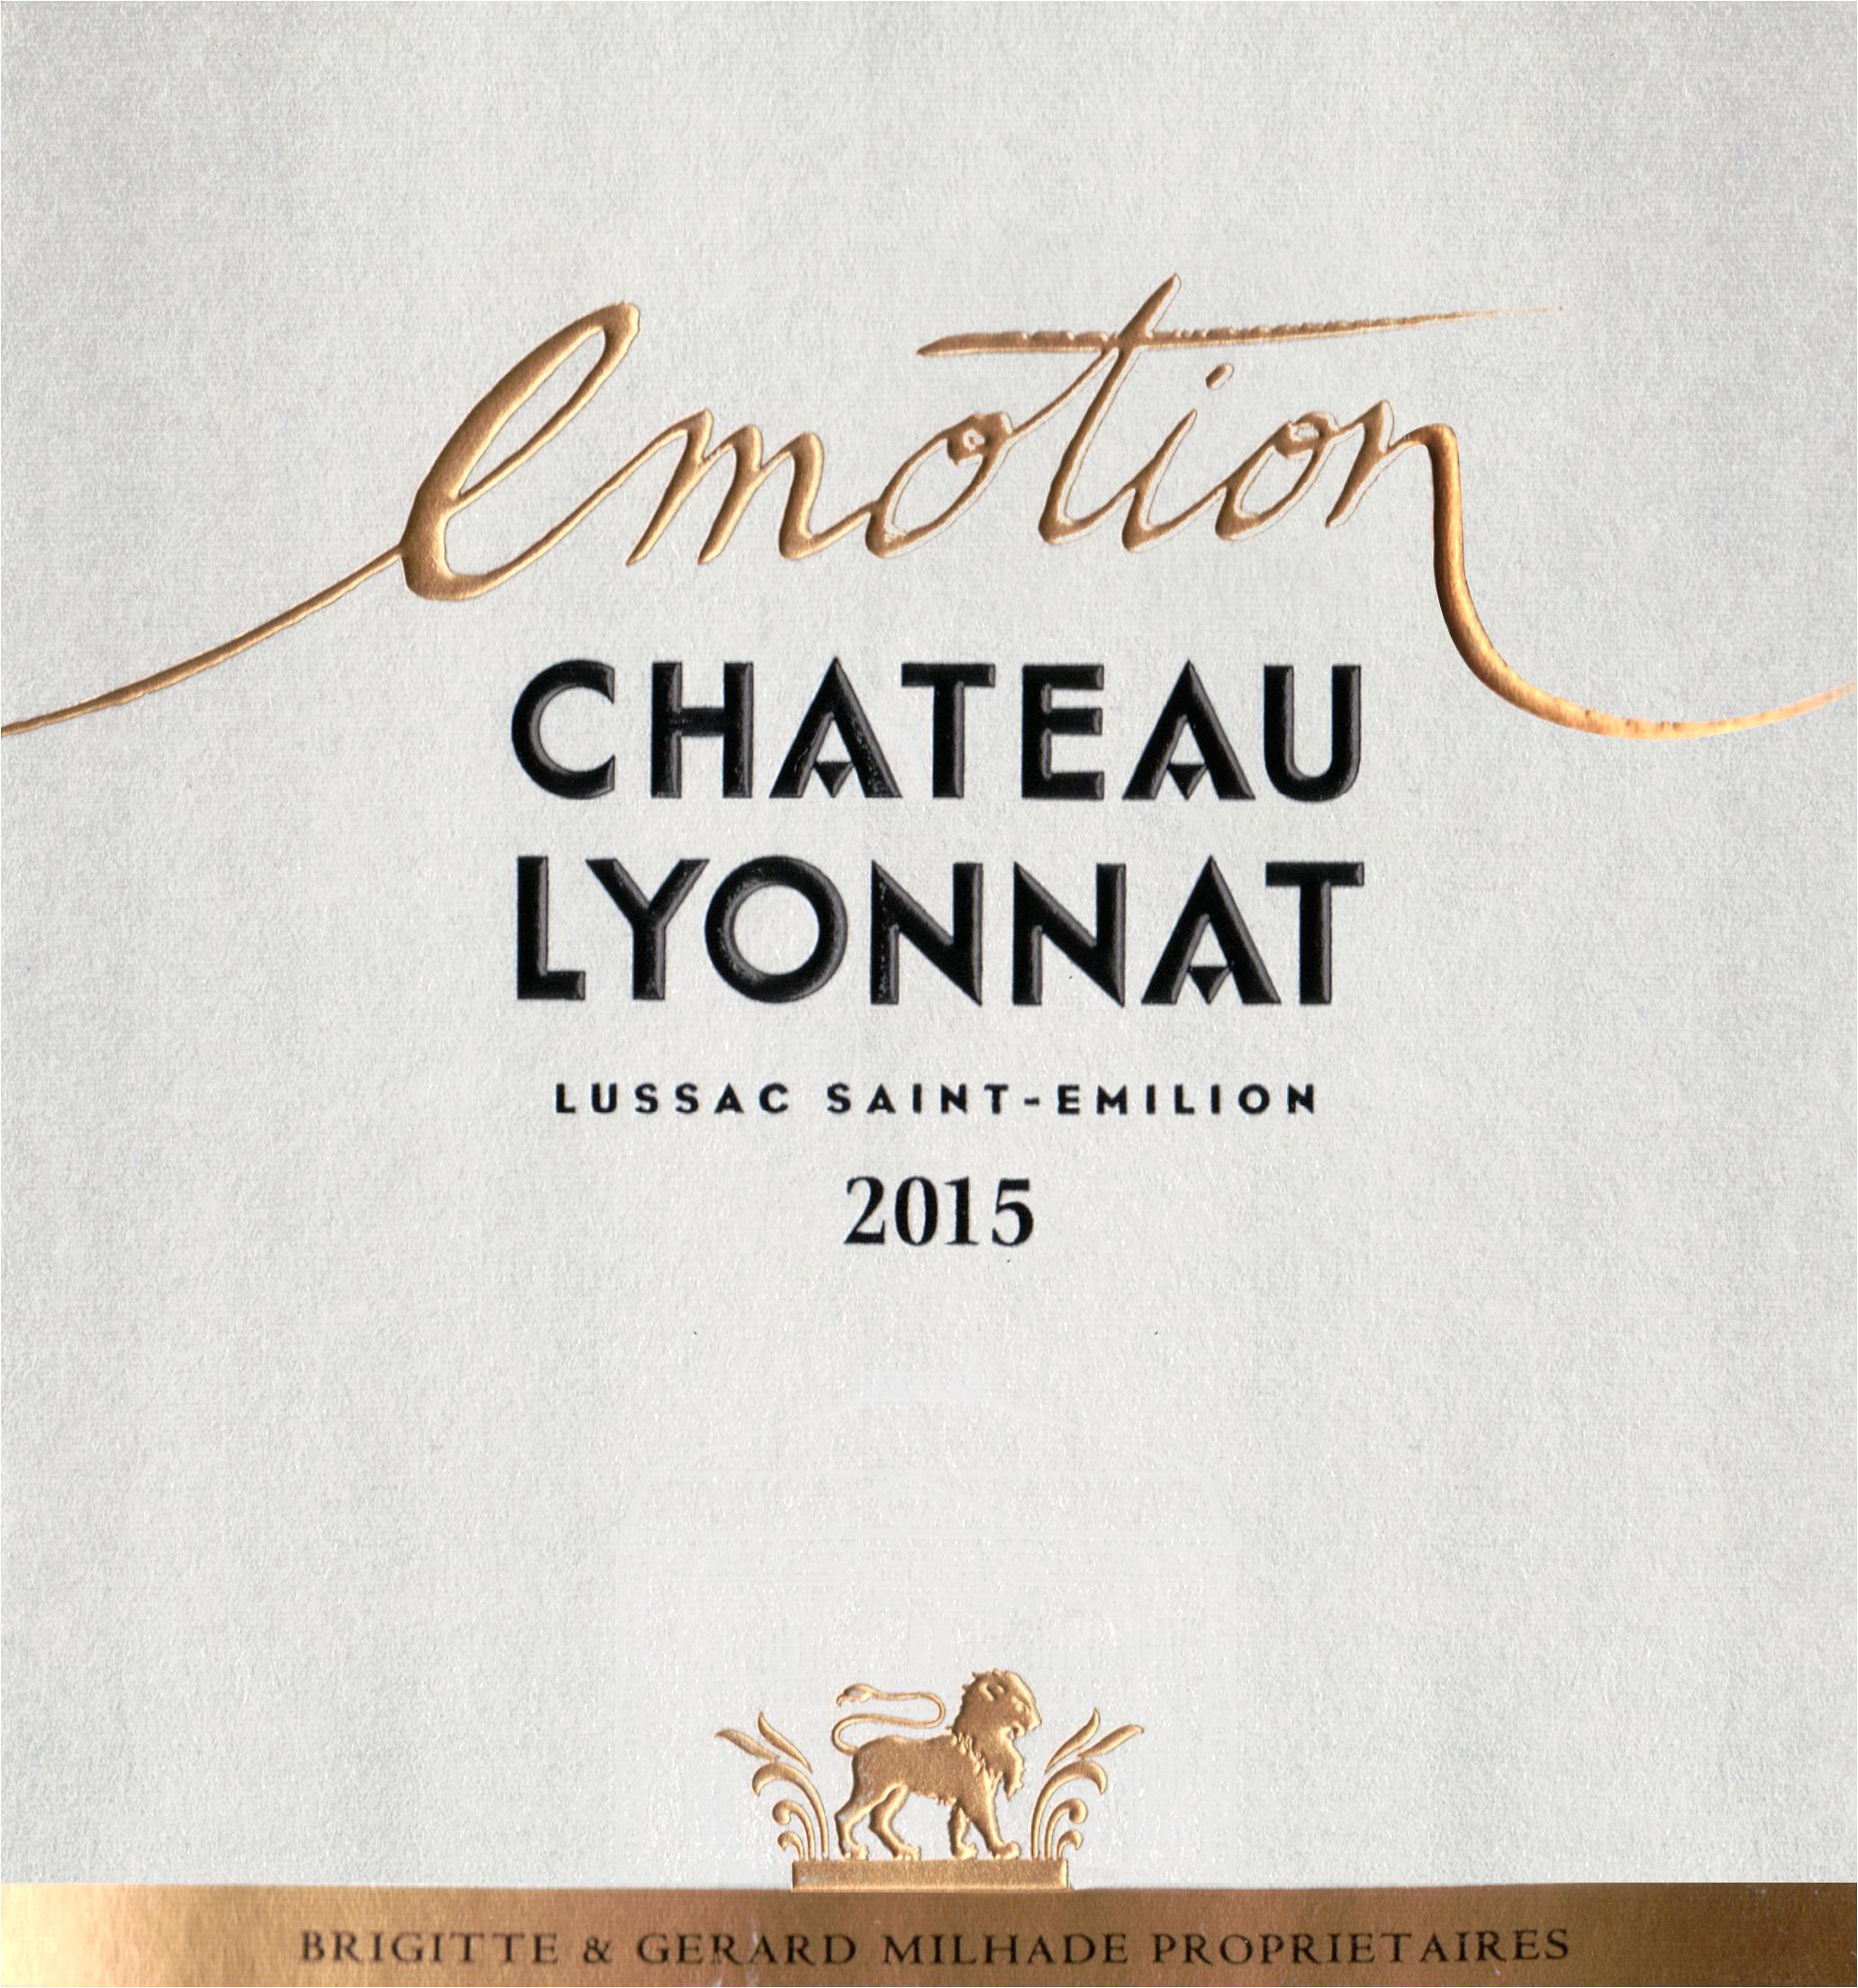 Chateau Lyonnat Lussac St Emilion Emotion 2015